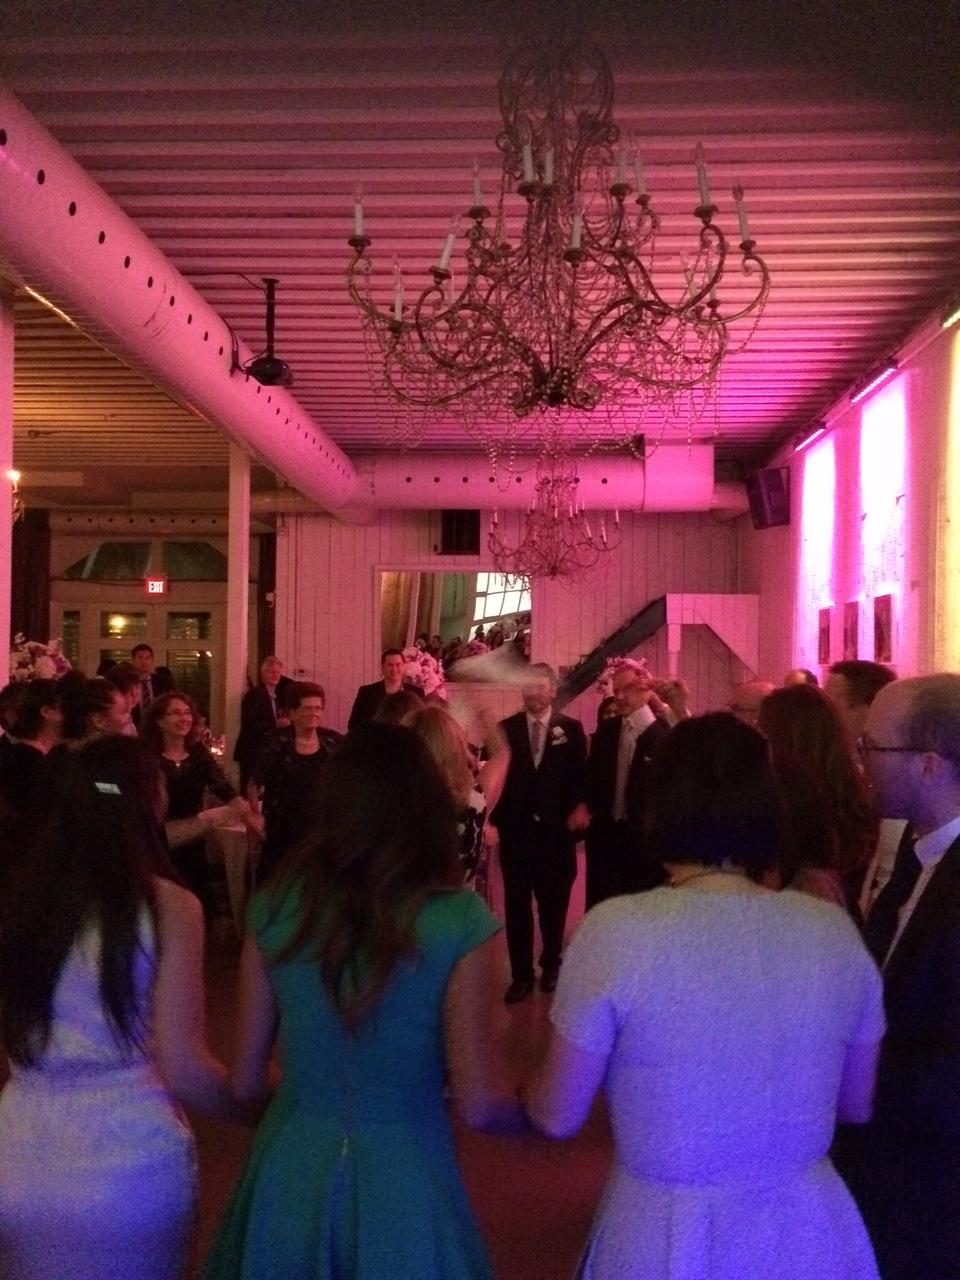 dance floor moves toronto wedding Del Vinyl Berkeley Feild House.JPG